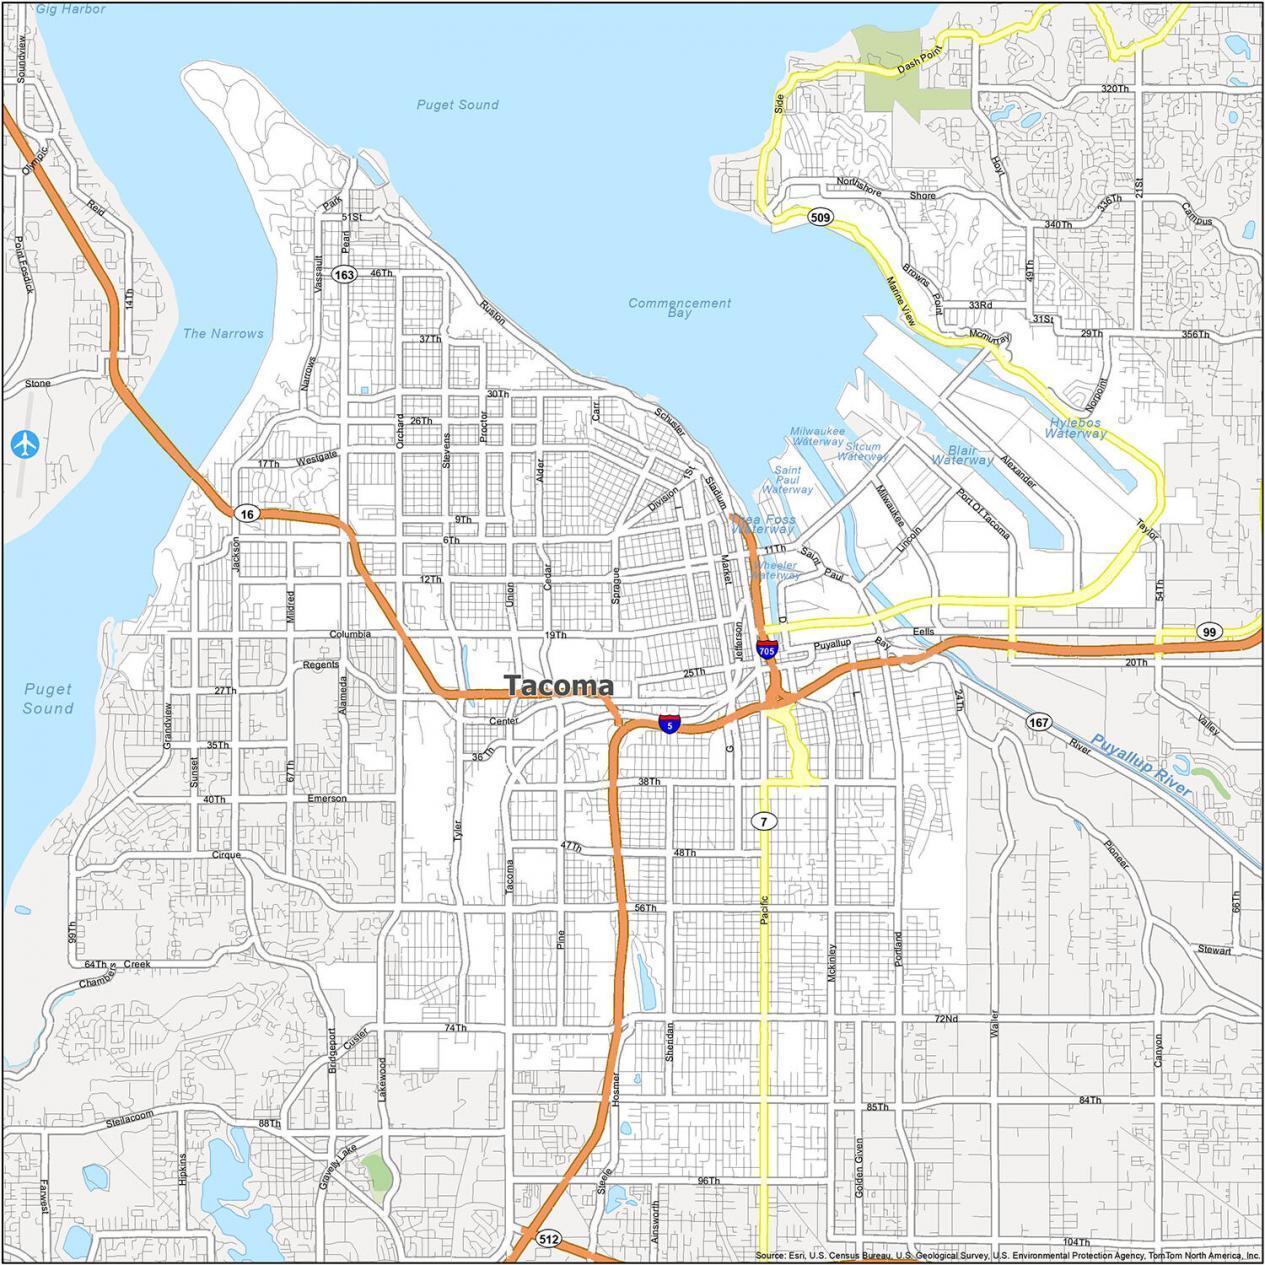 Tacoma Road Map